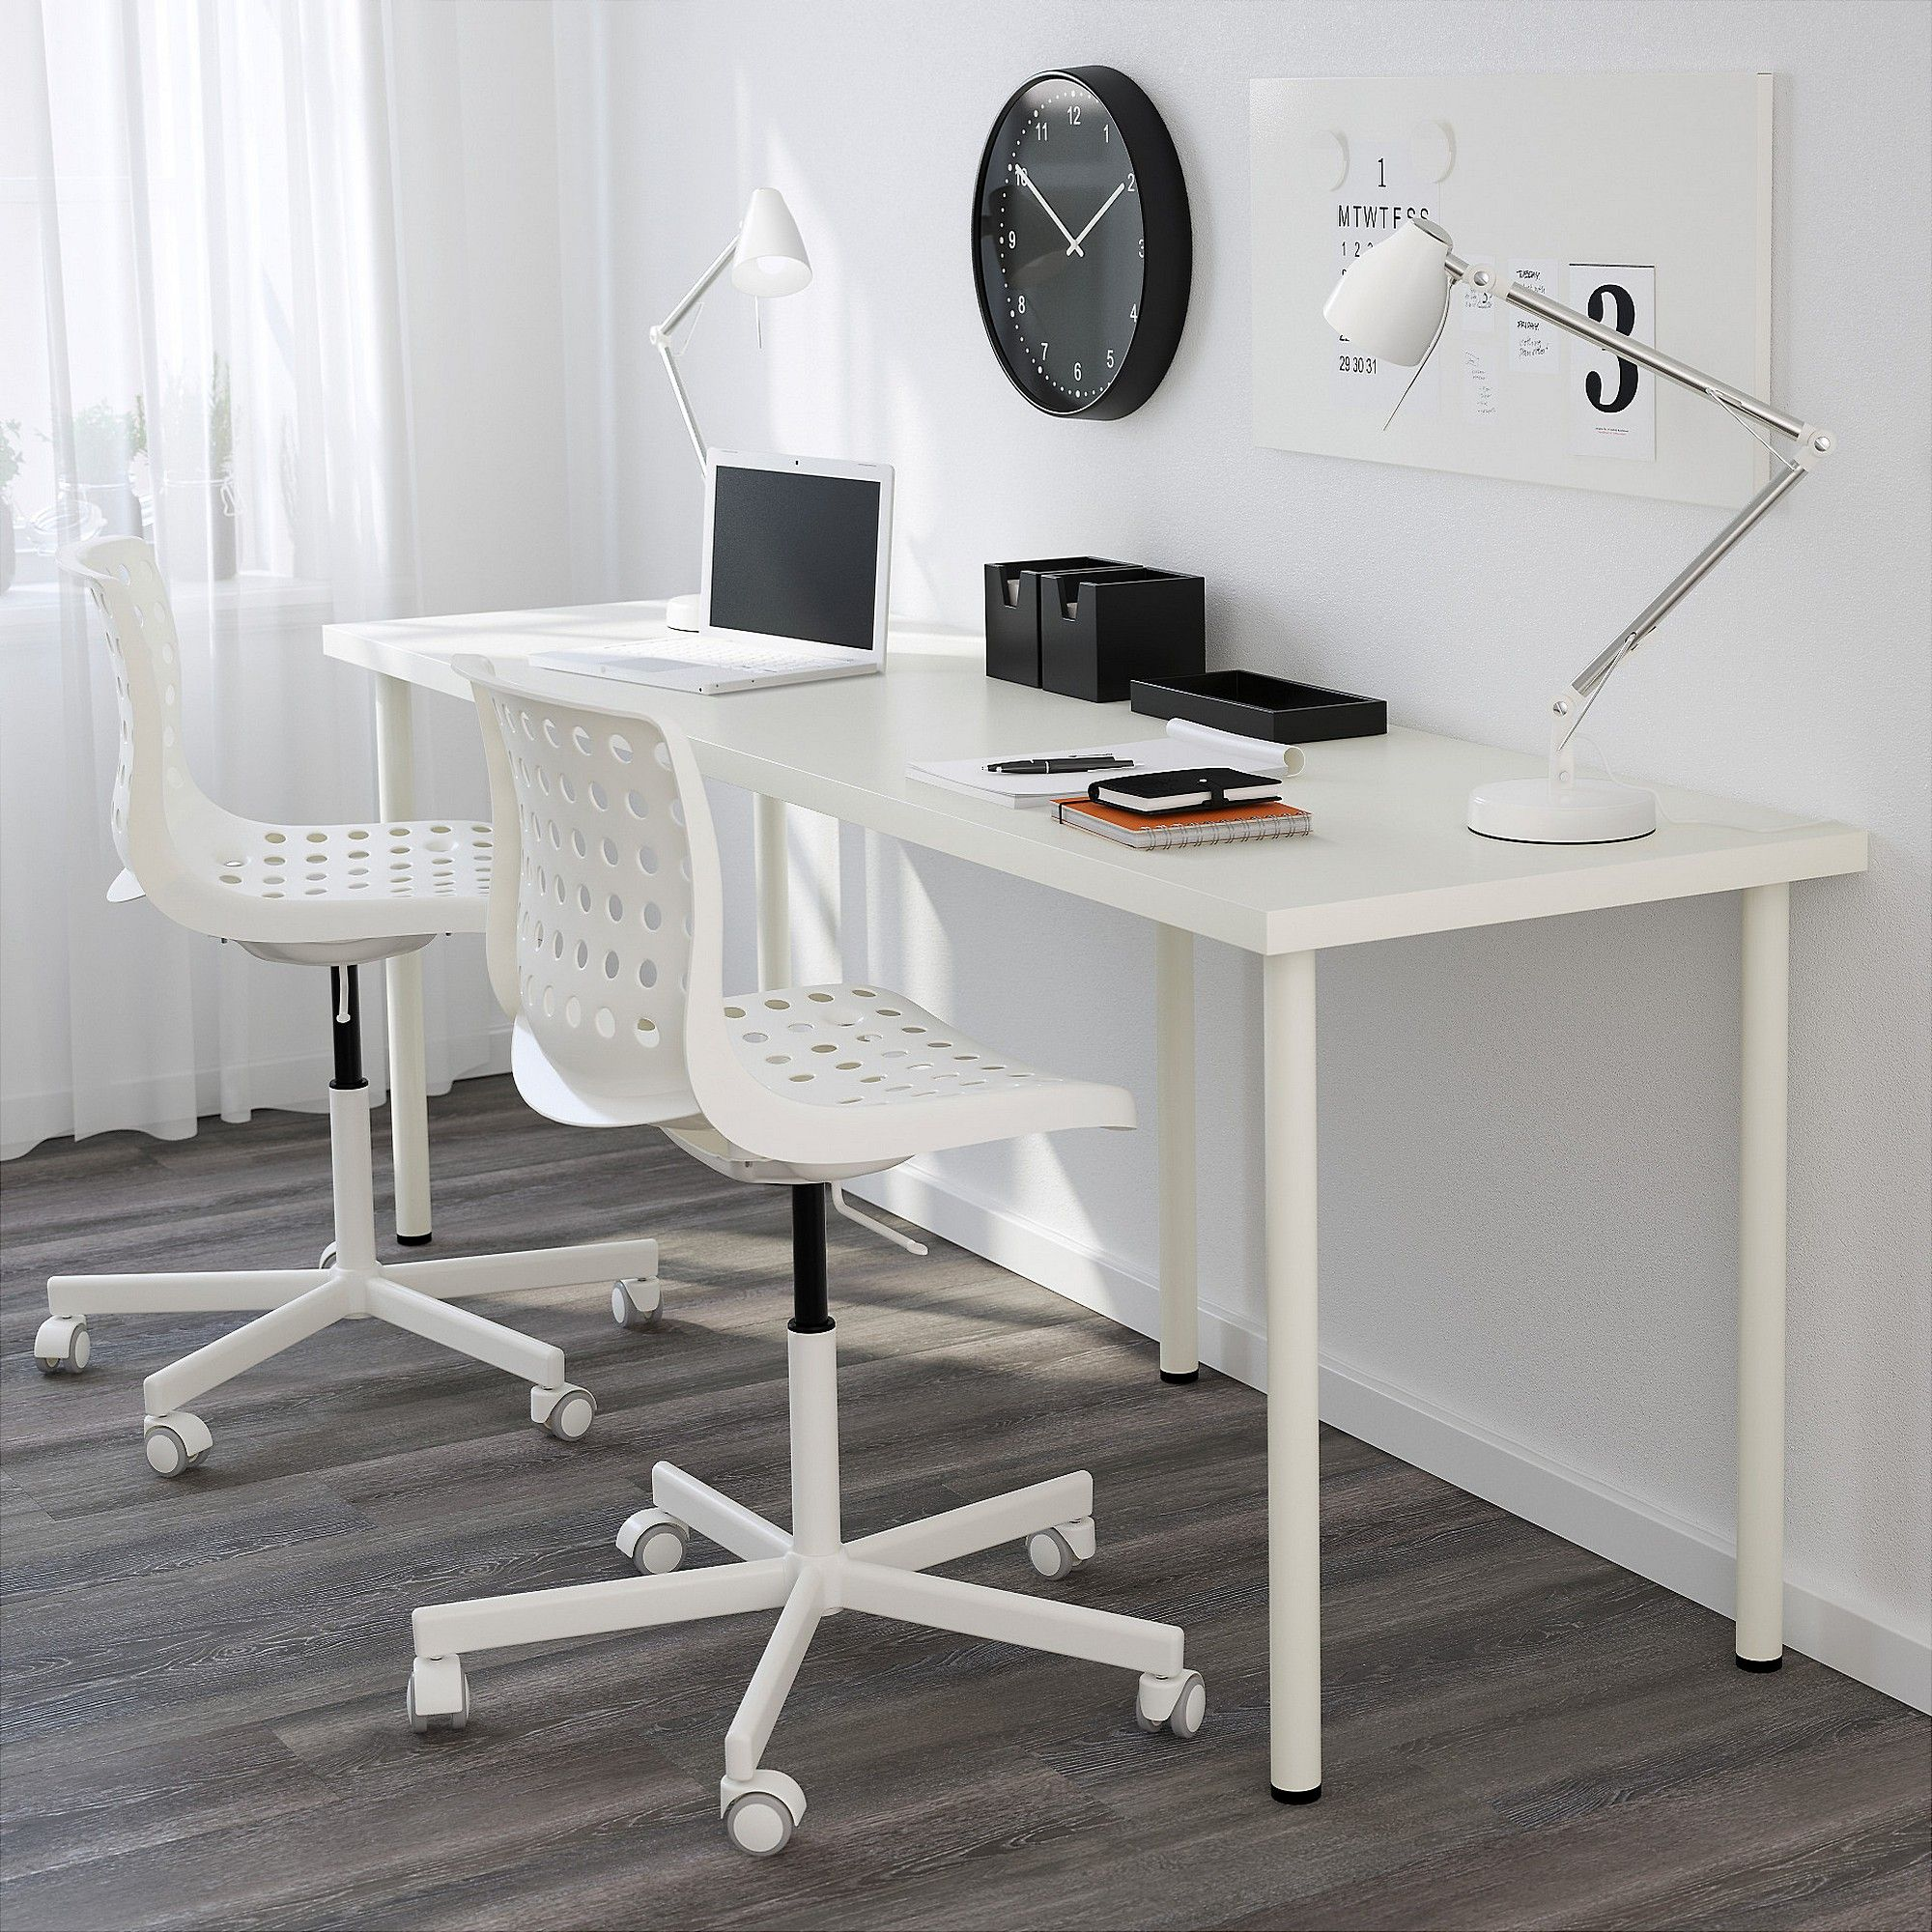 clean white ikea linnmon adils desk setup with laptop on it